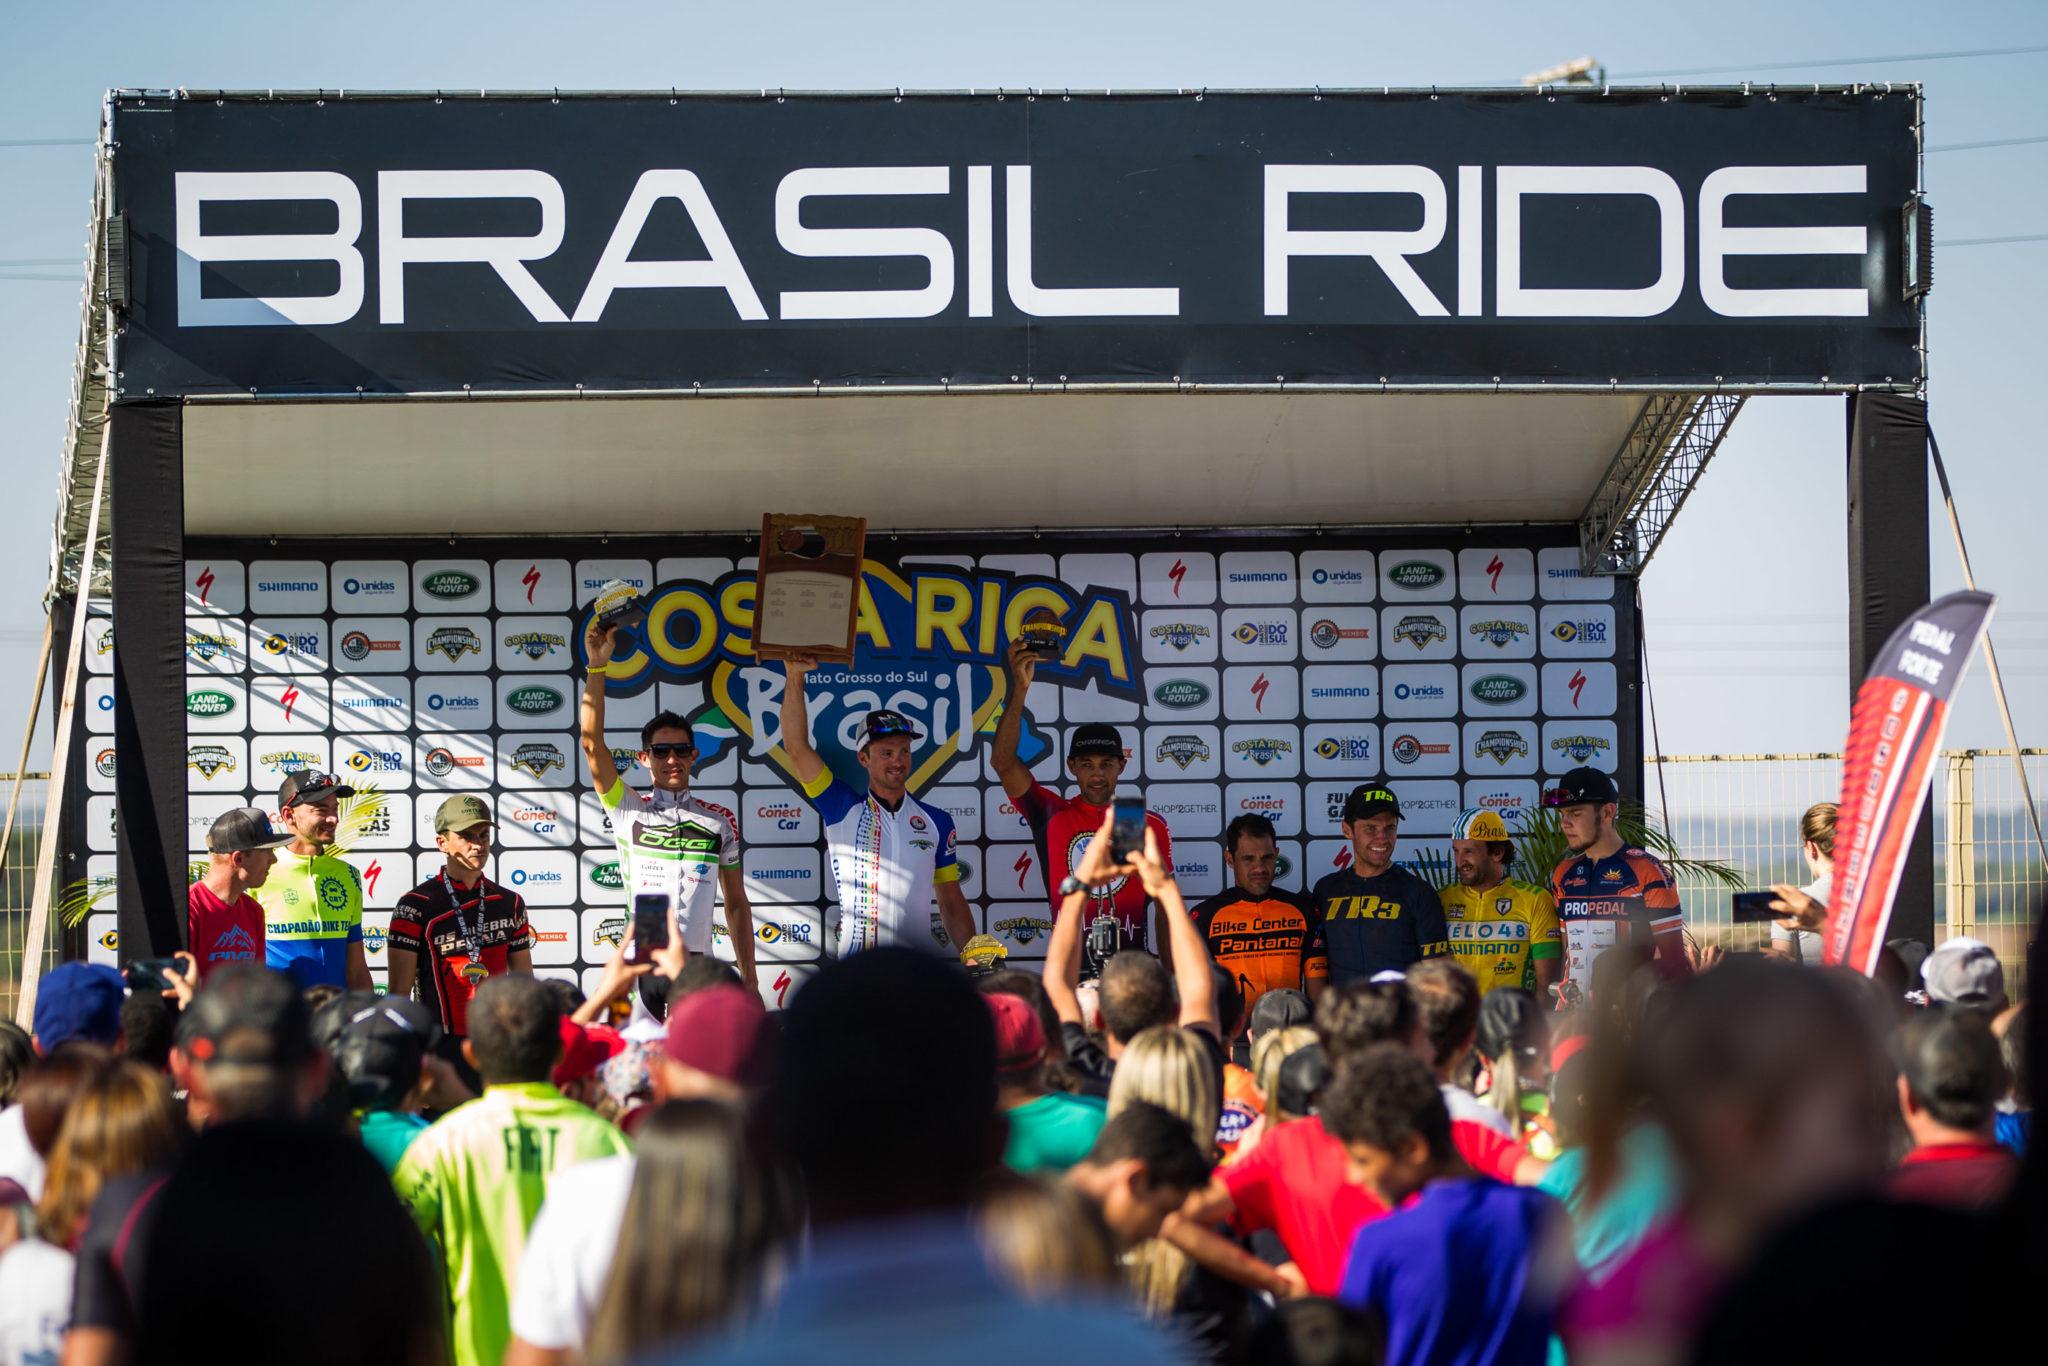 Pódio da elite masculina  (Fabio Piva / Brasil Ride)